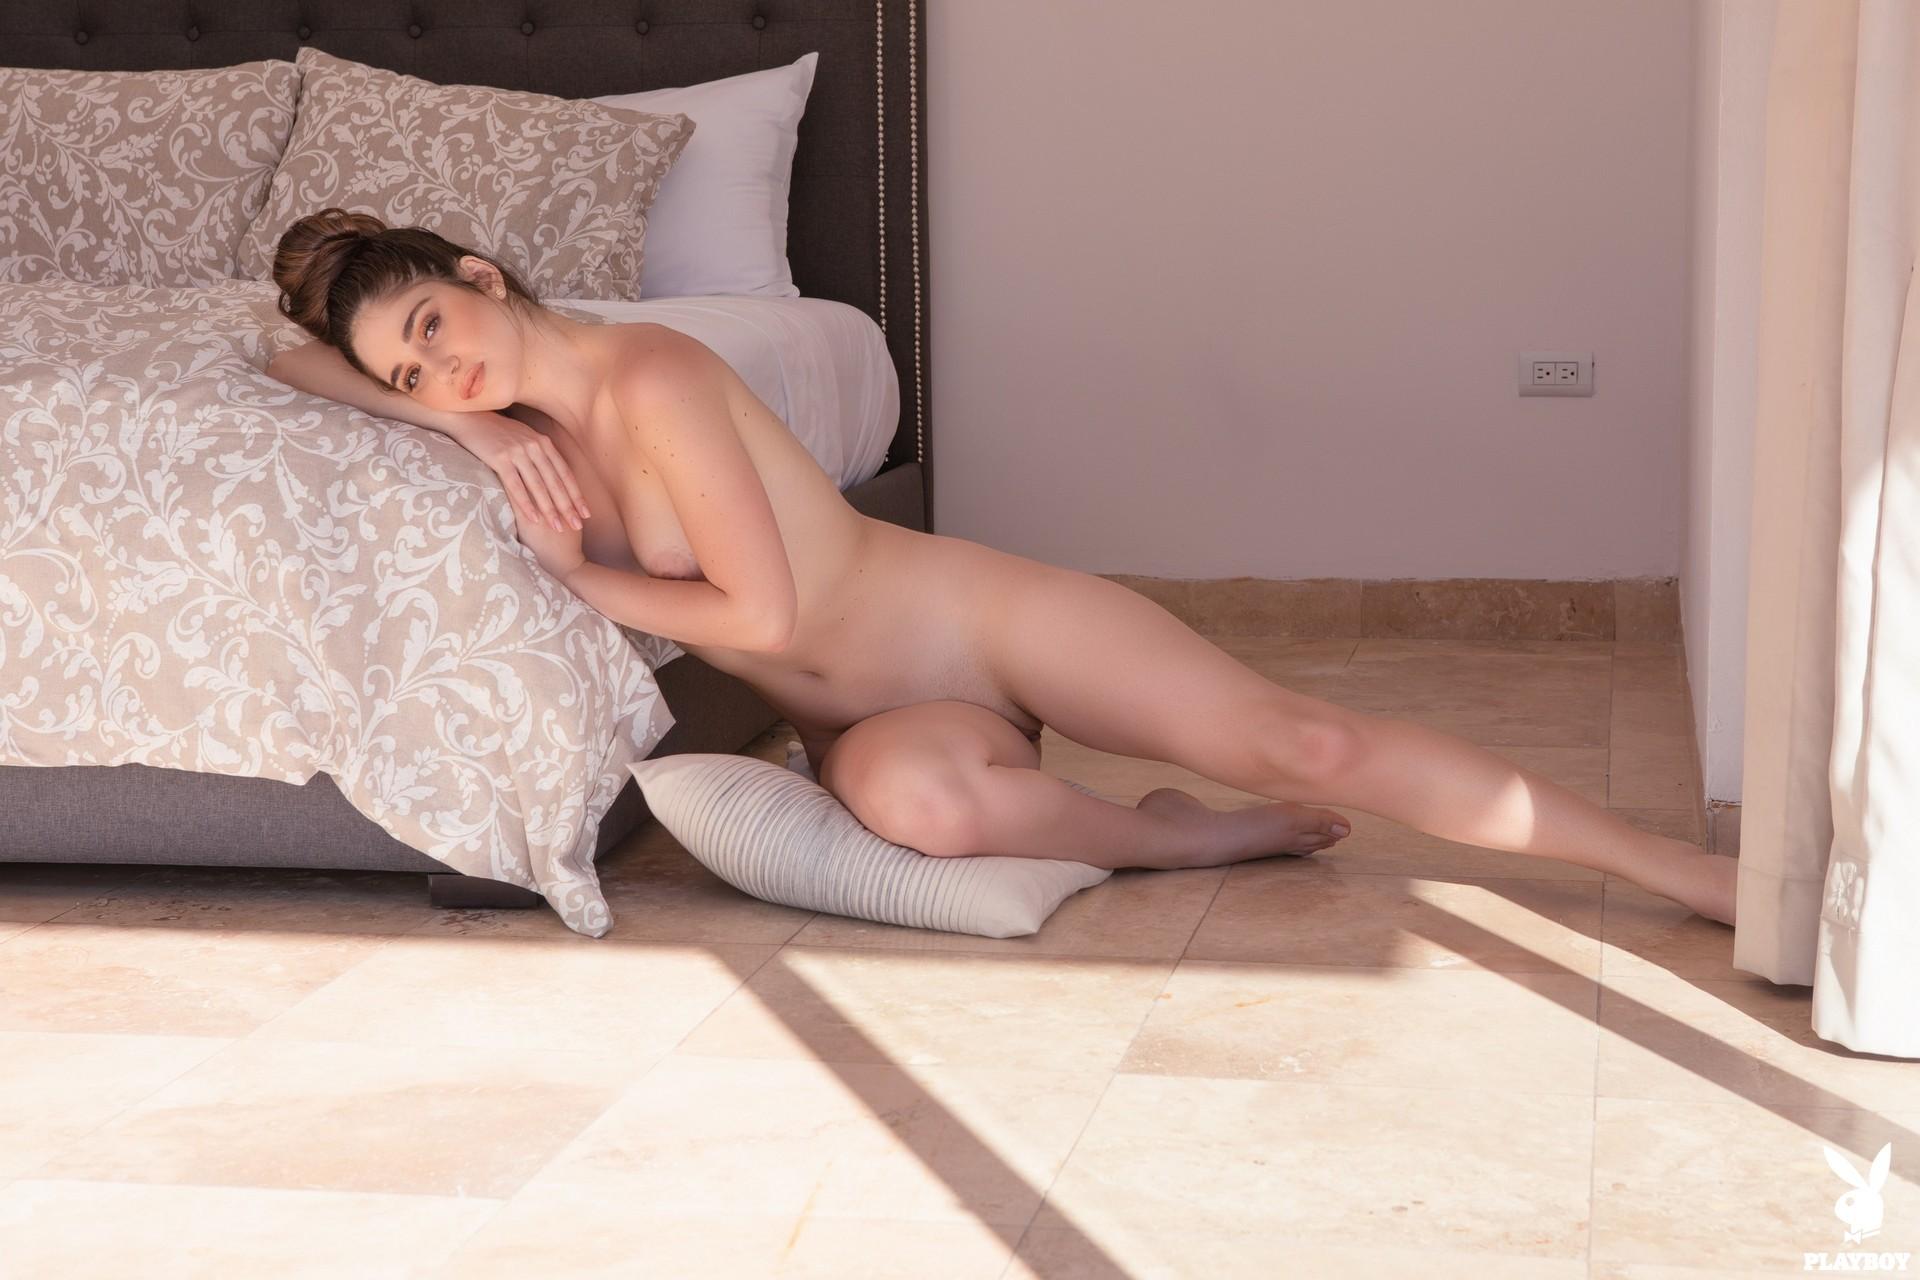 Rosé in Daybreak Dream - Playboy Plus 22